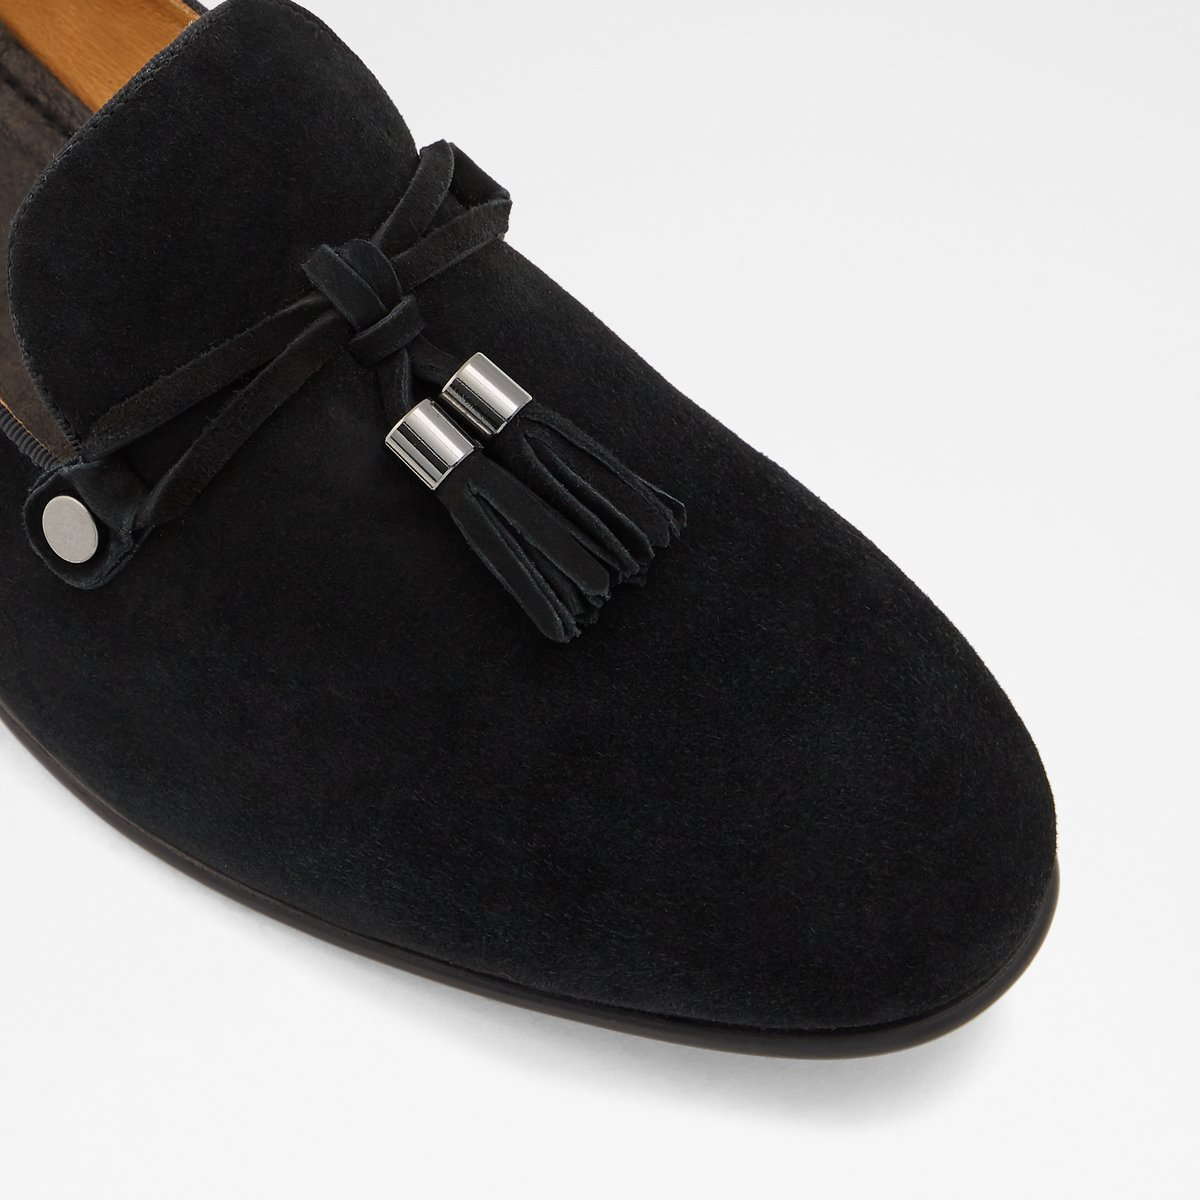 Mccrery Black Men's Loafers   ALDO US